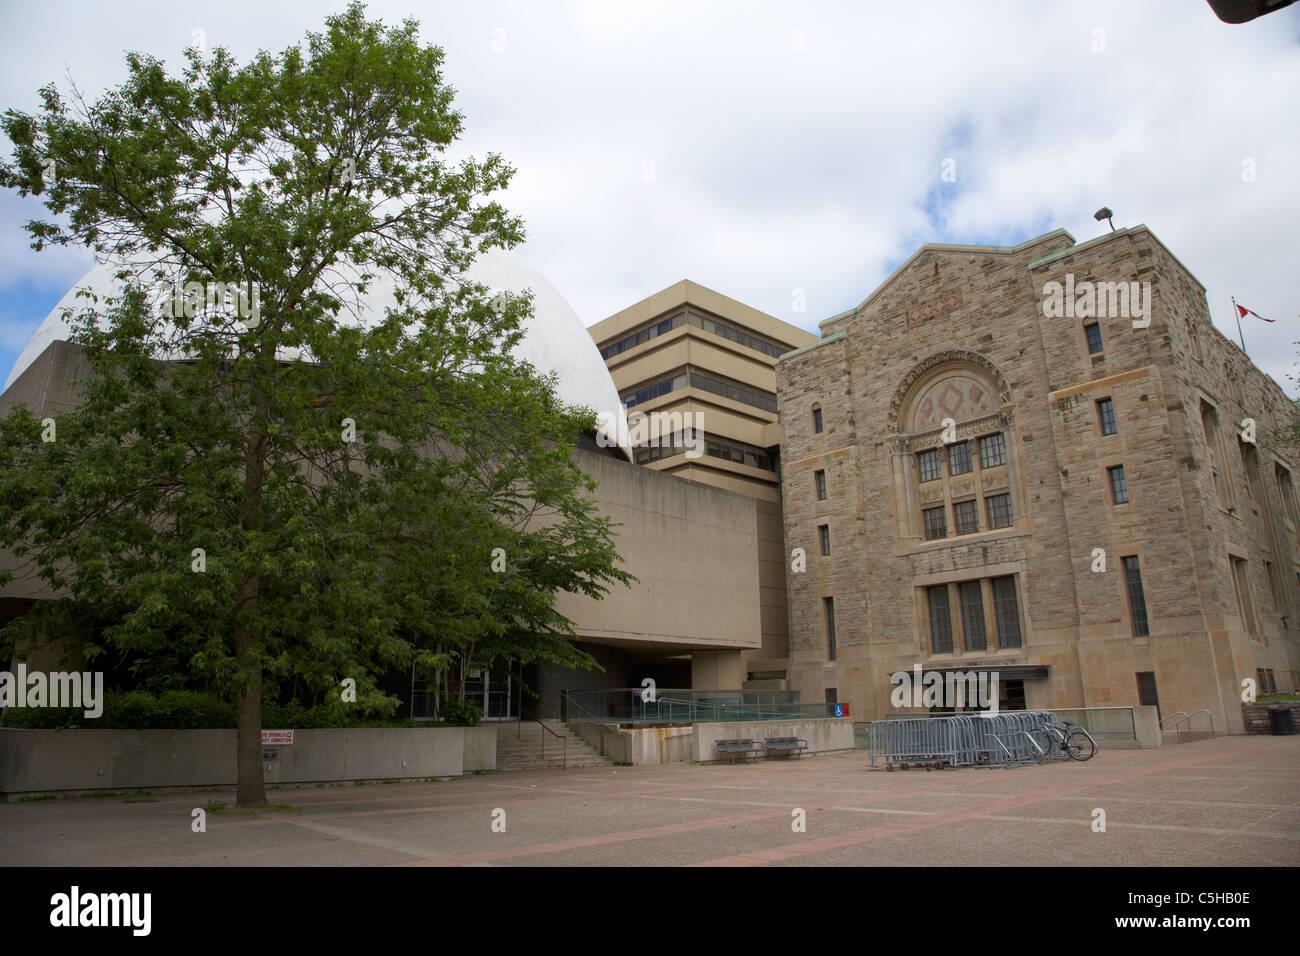 the McLaughlin Planetarium building and ROM museum toronto ontario canada - Stock Image